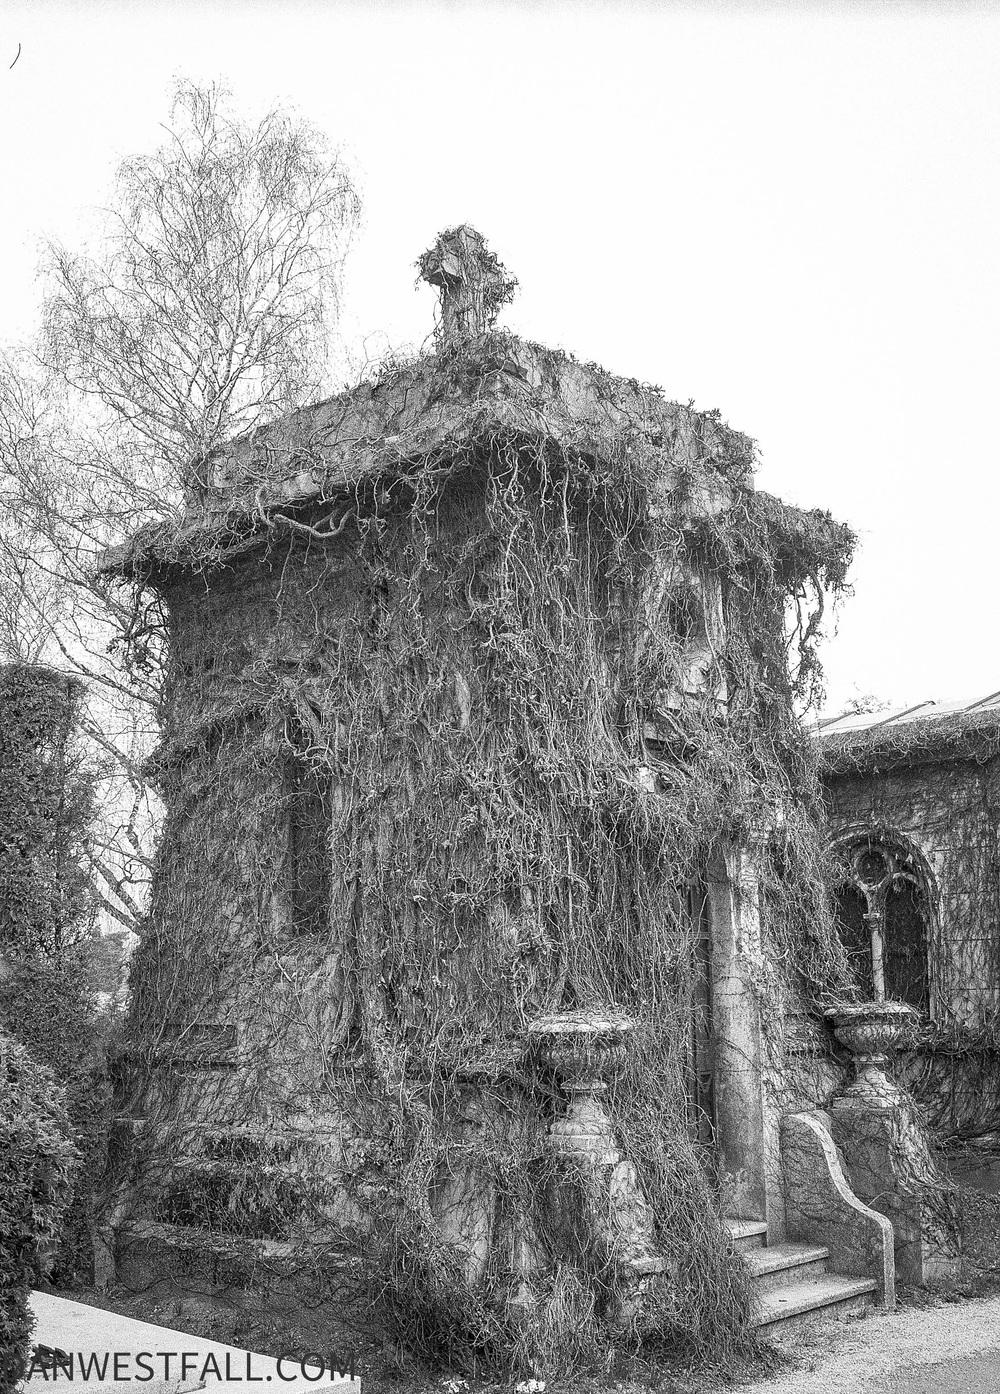 Croatia. Overgrown crypt. #0573